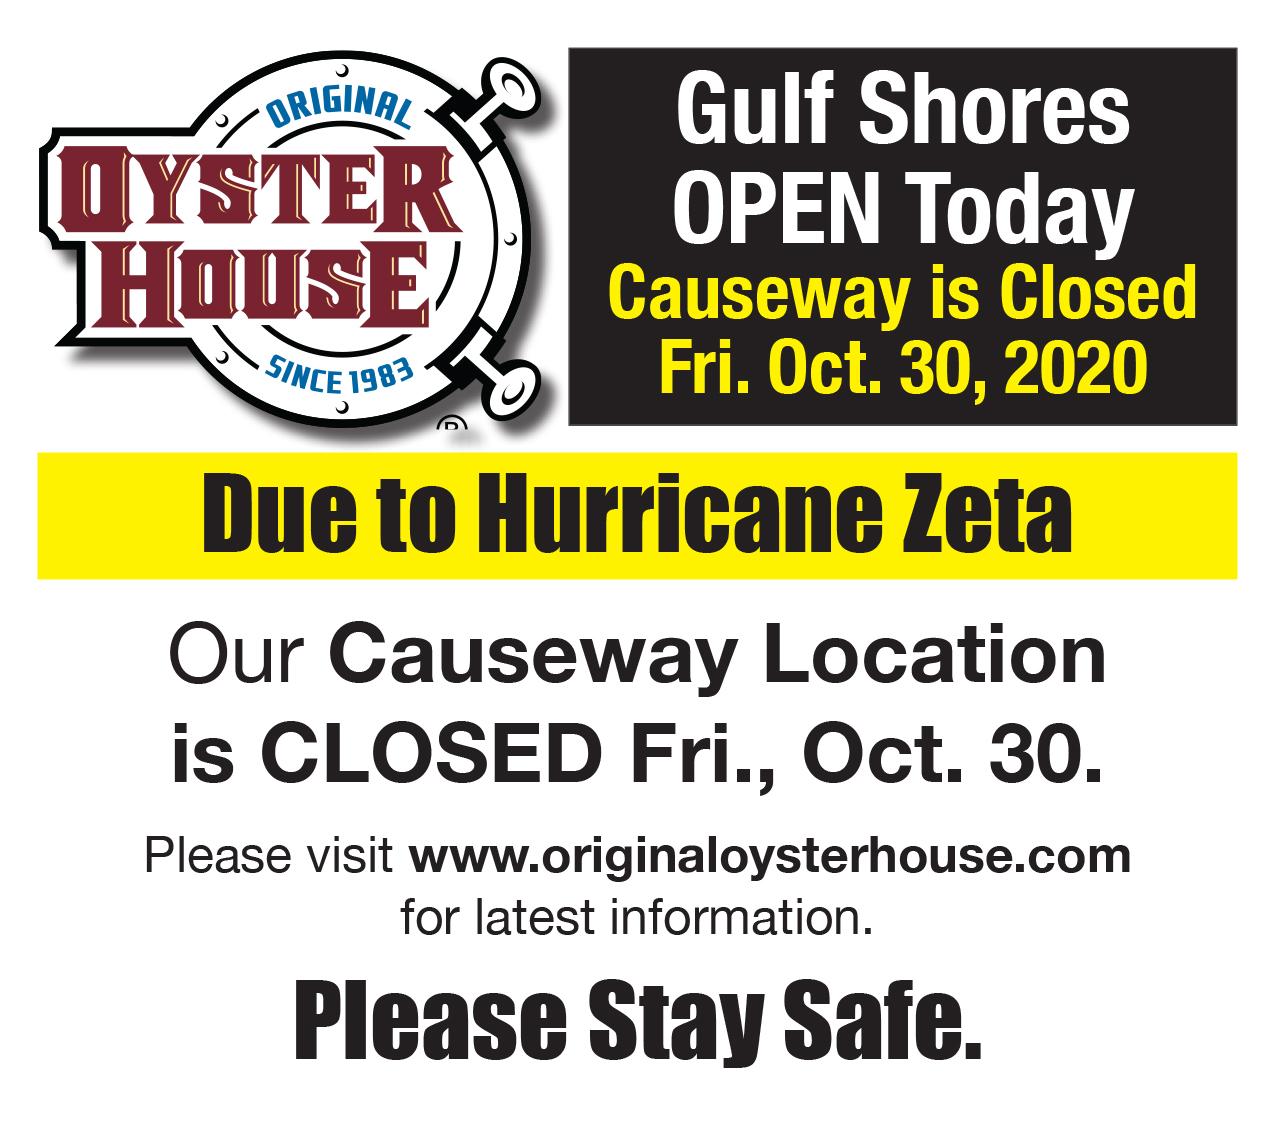 Gulf Shores Open | Causeway Closed Fri. Oct. 30 due to Hurricane Zeta